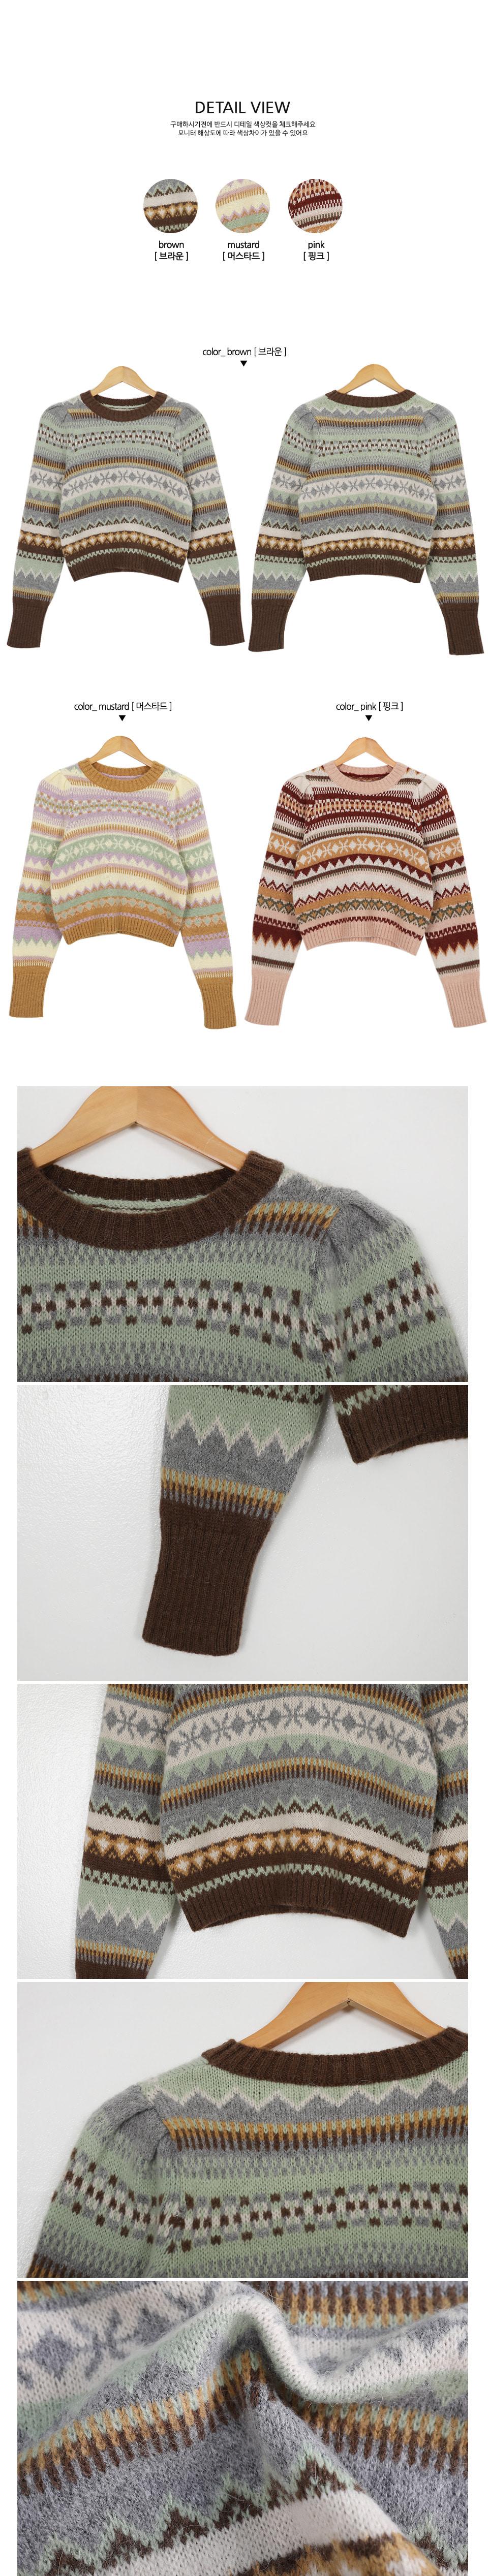 Foaming Antique Semi-knit